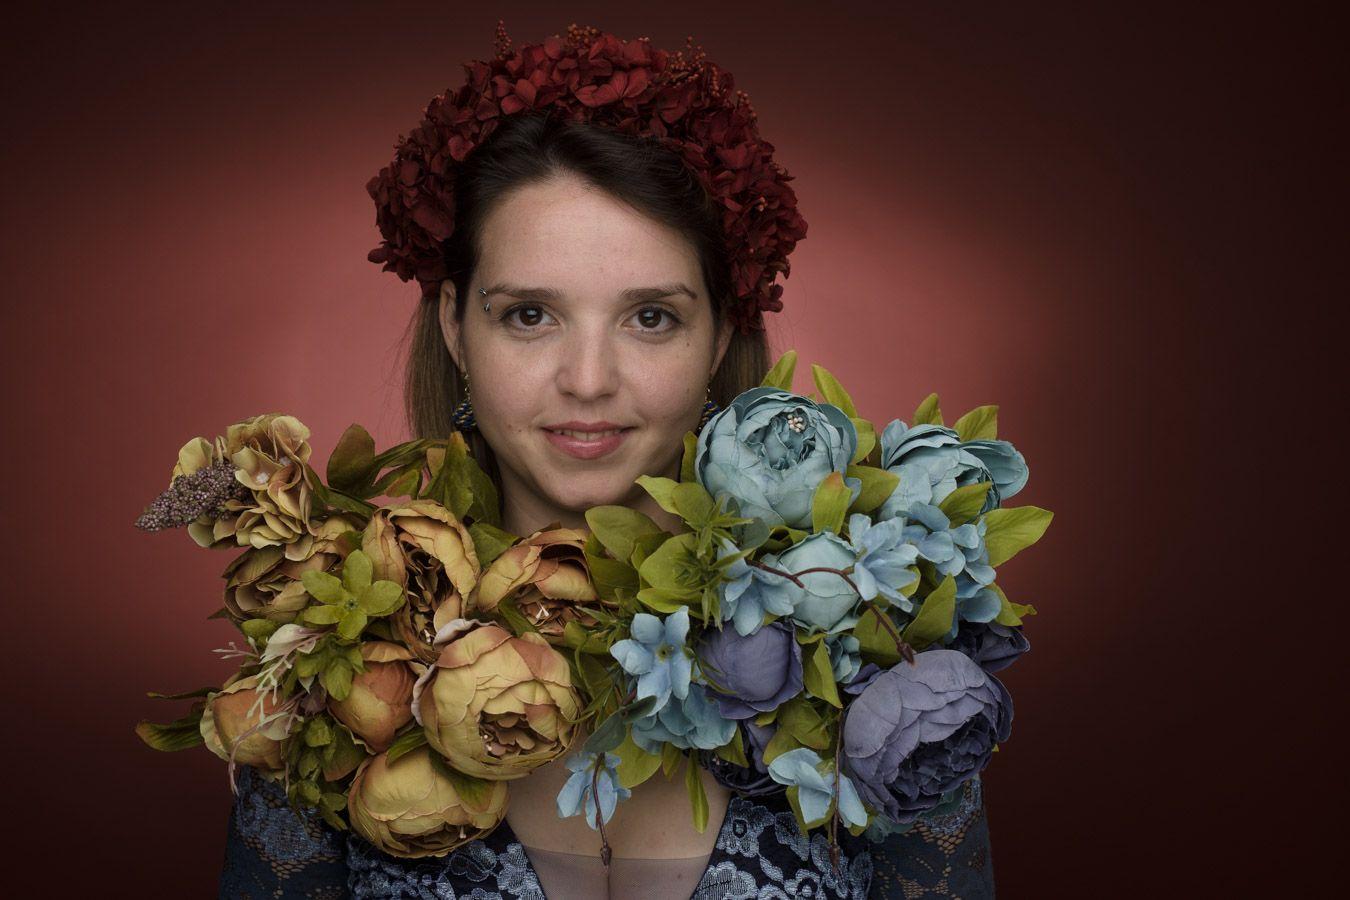 Flowers with soul - Simona Maria Munteanu